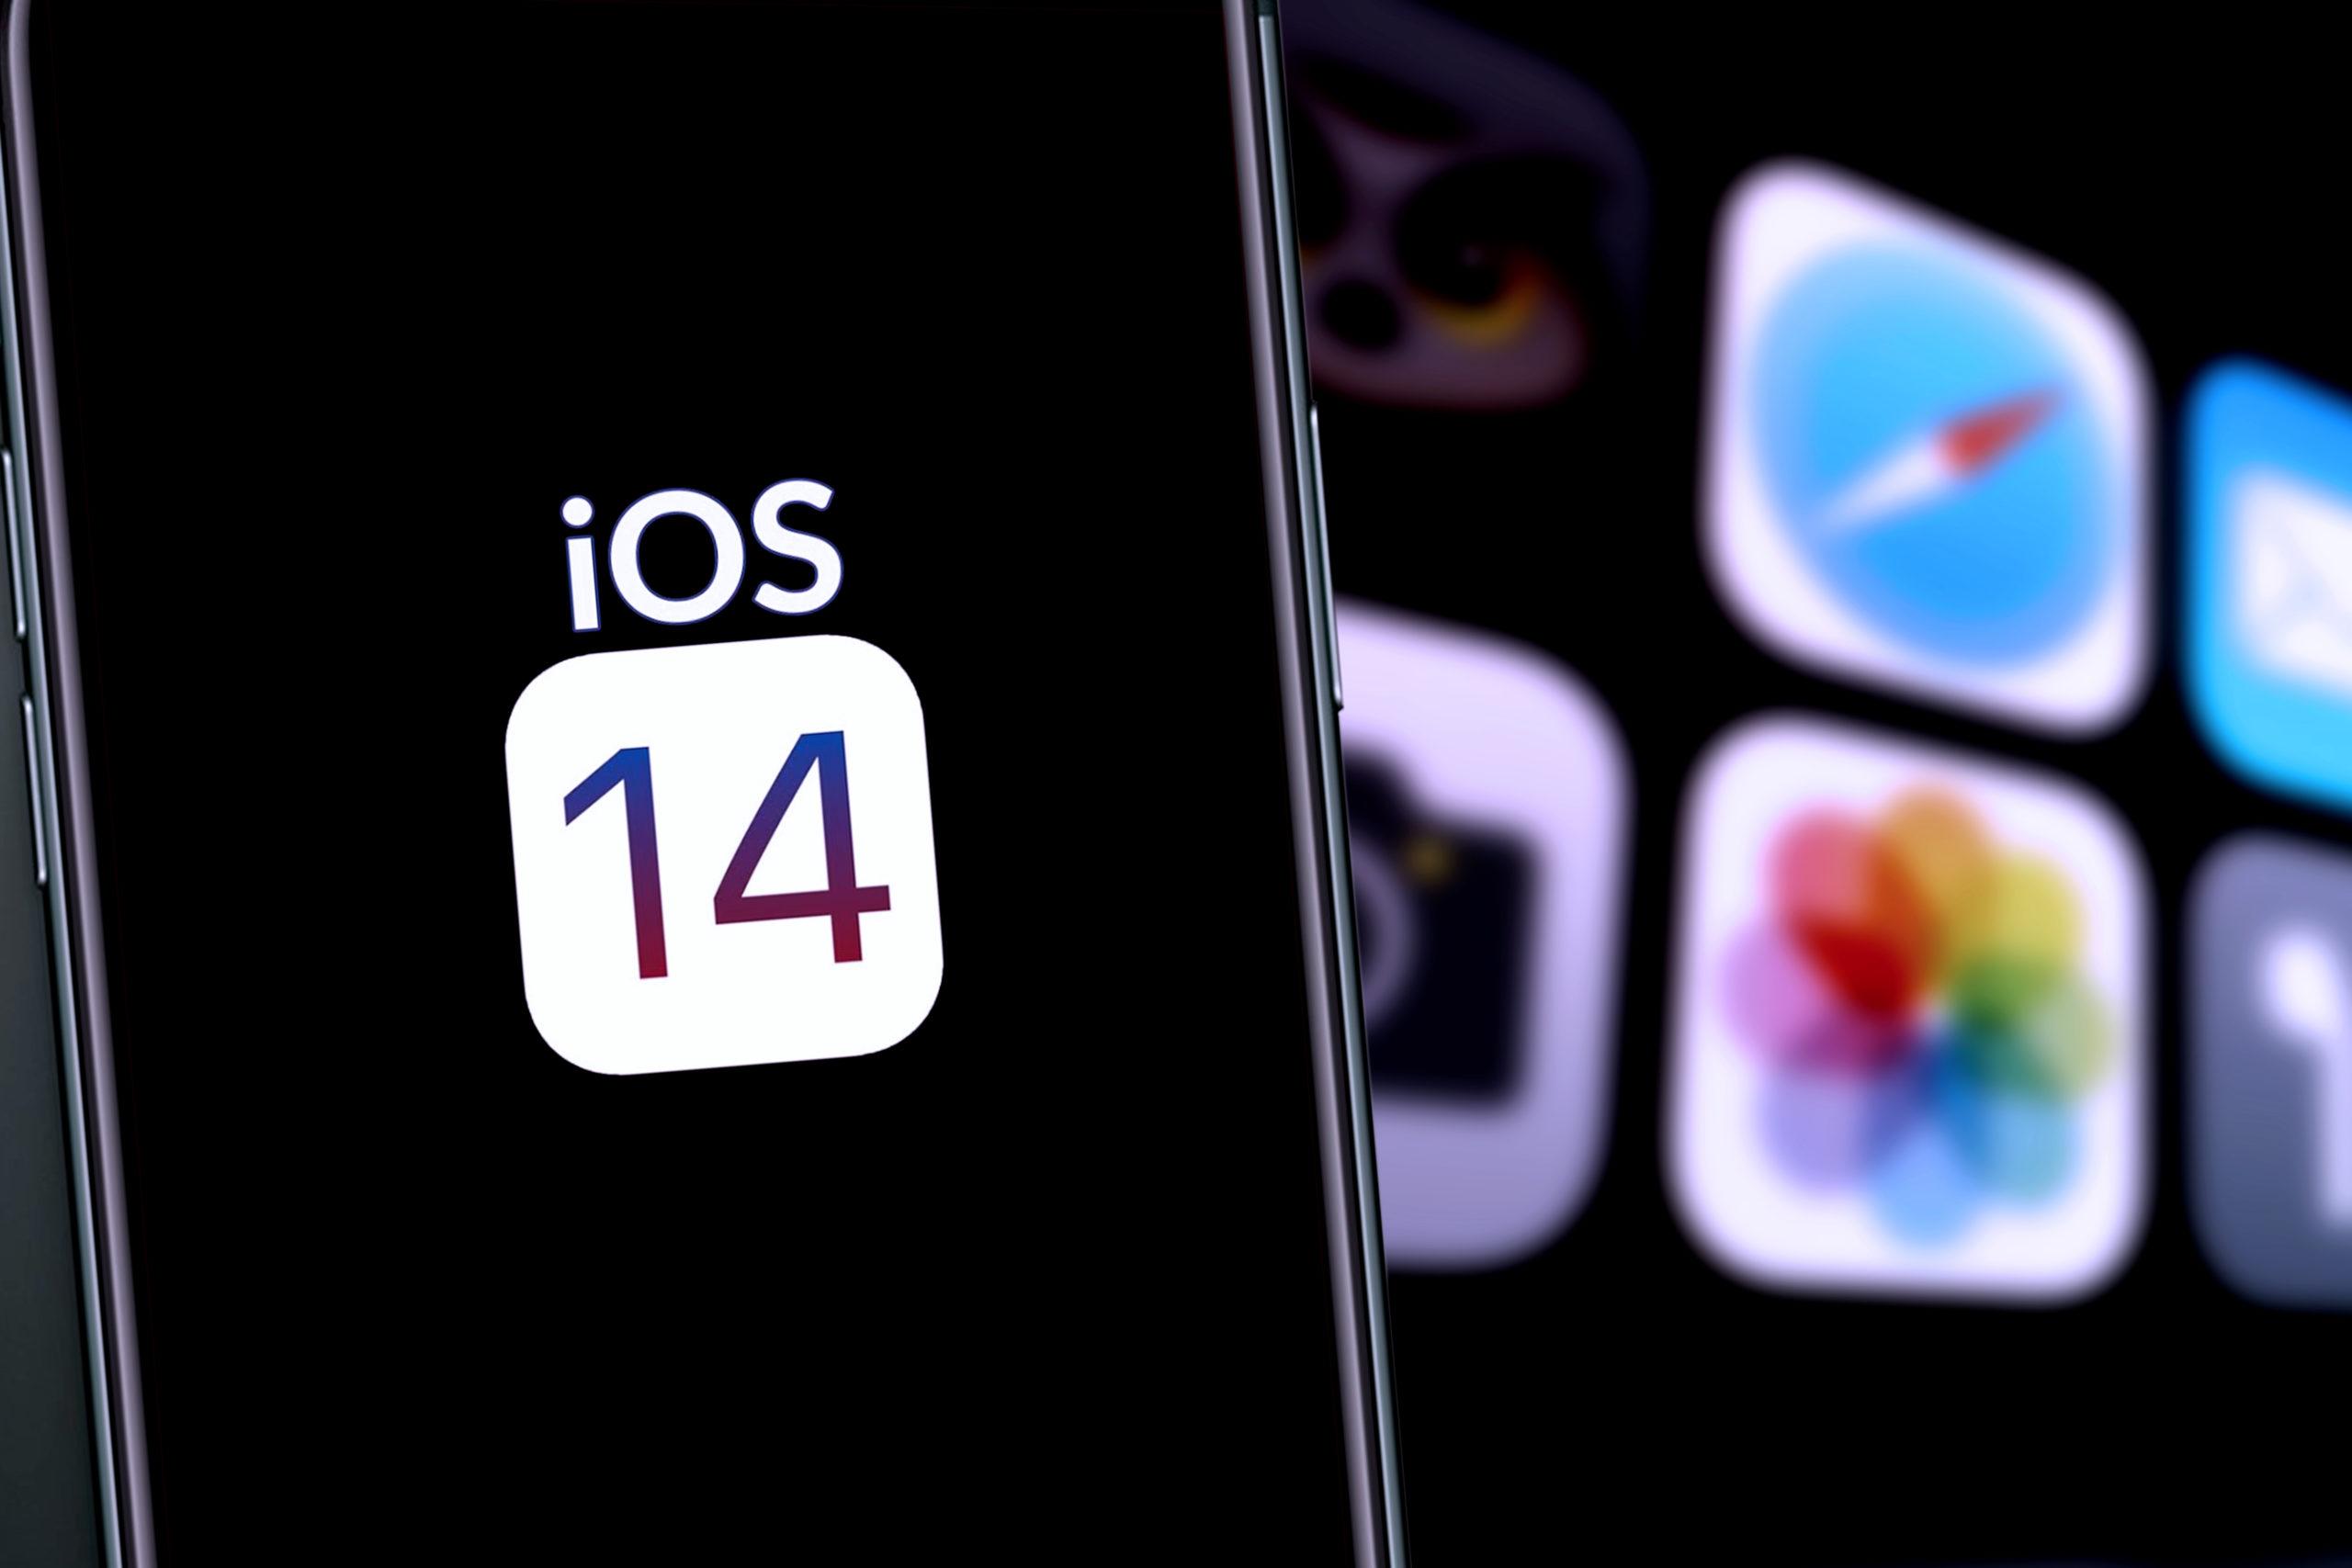 Changement-facebook-ios14-apple